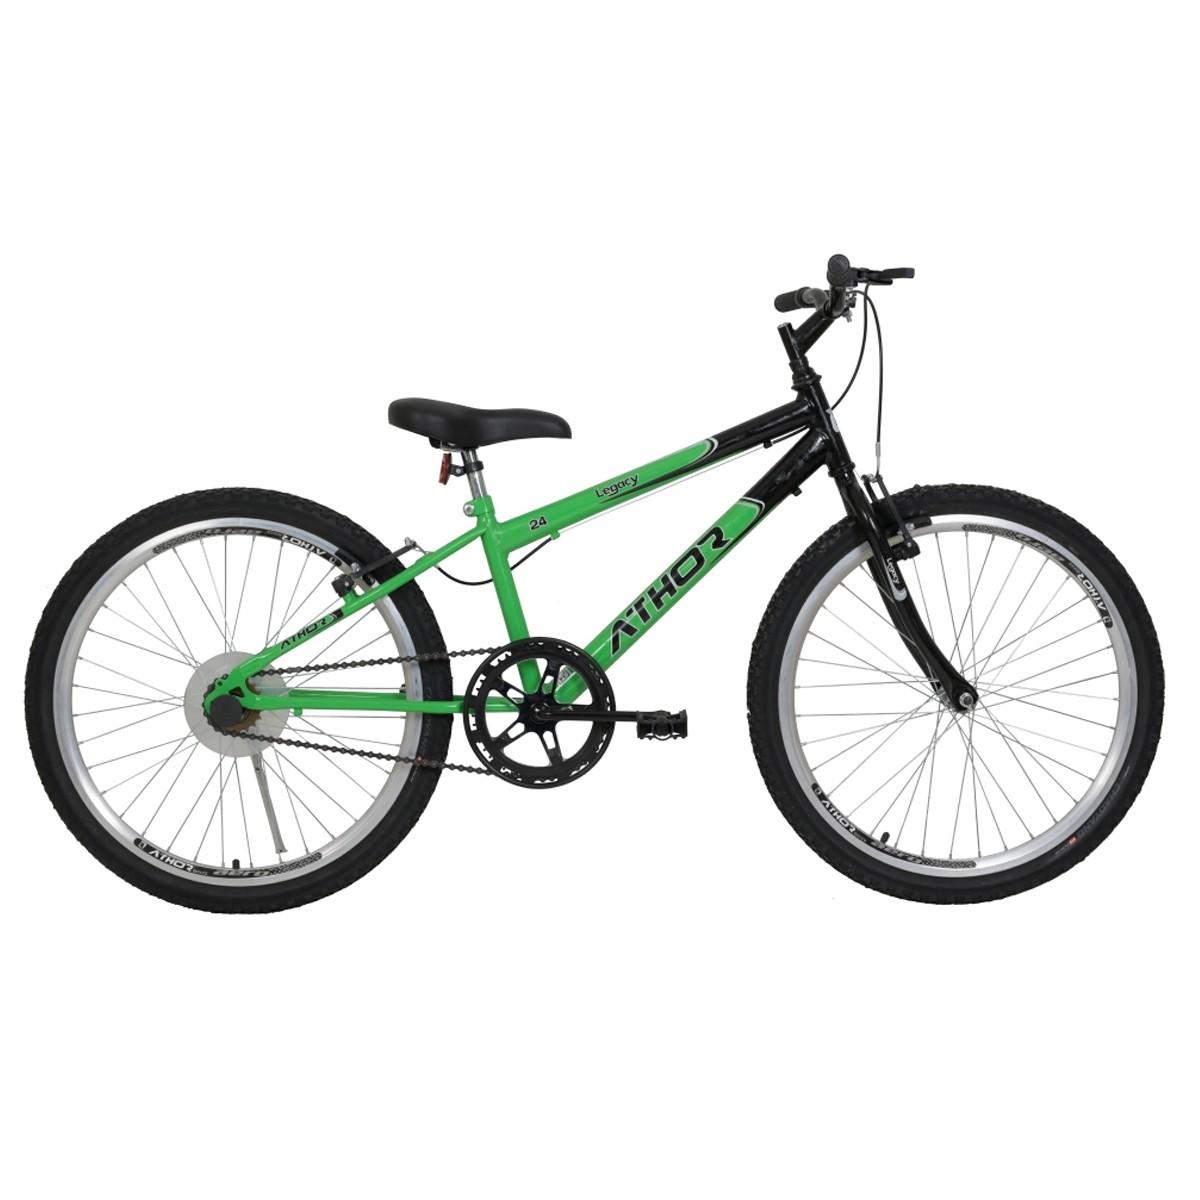 Bicicleta Athor Legacy Infantil Aro 24 Masculino S/ Marcha